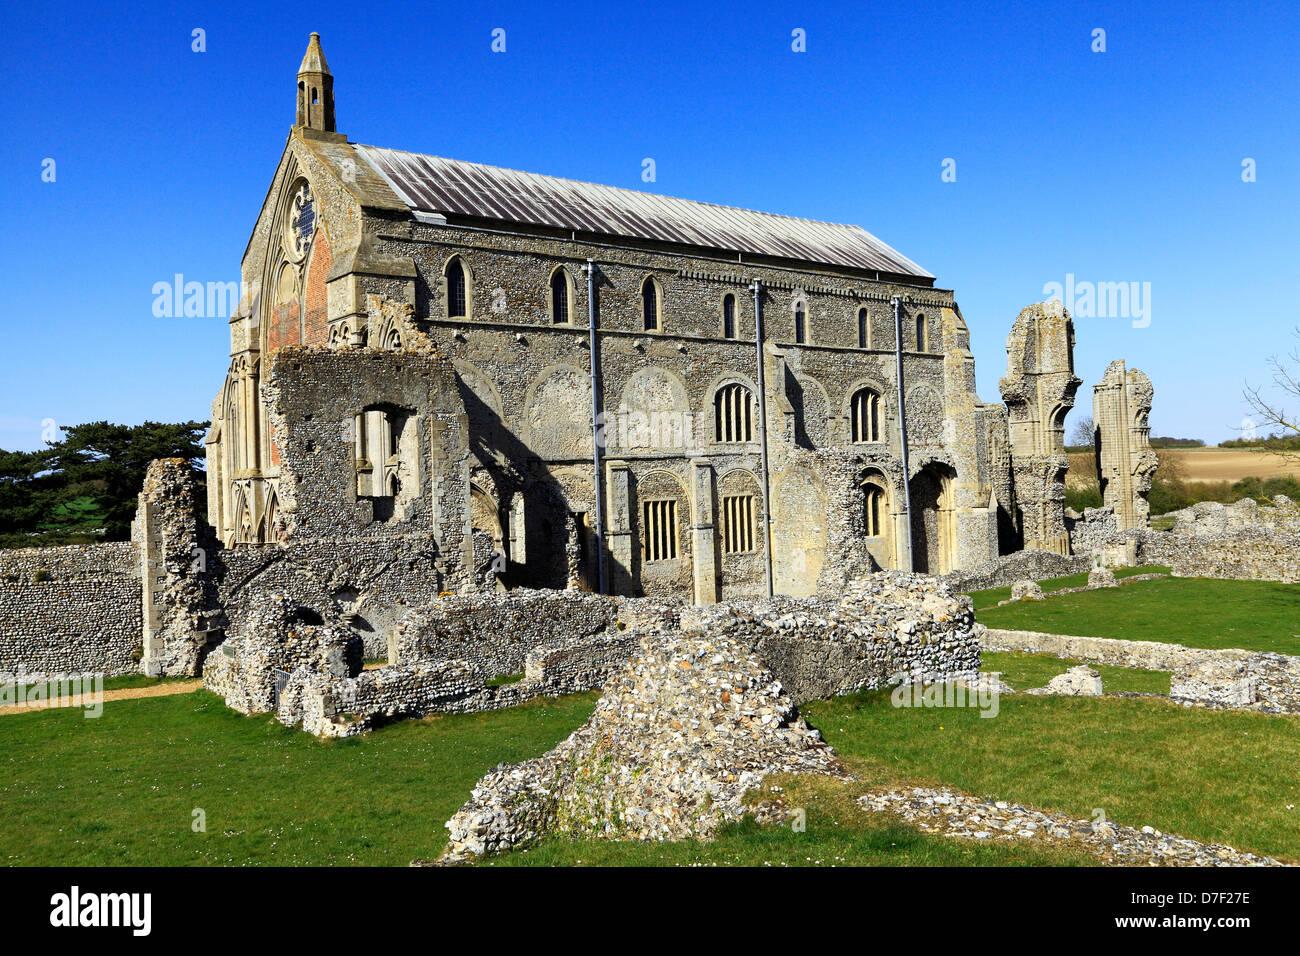 Binham Priory, Norfolk, Church and Monastic ruins, English medieval architecture, England UK, Benedictine Order - Stock Image